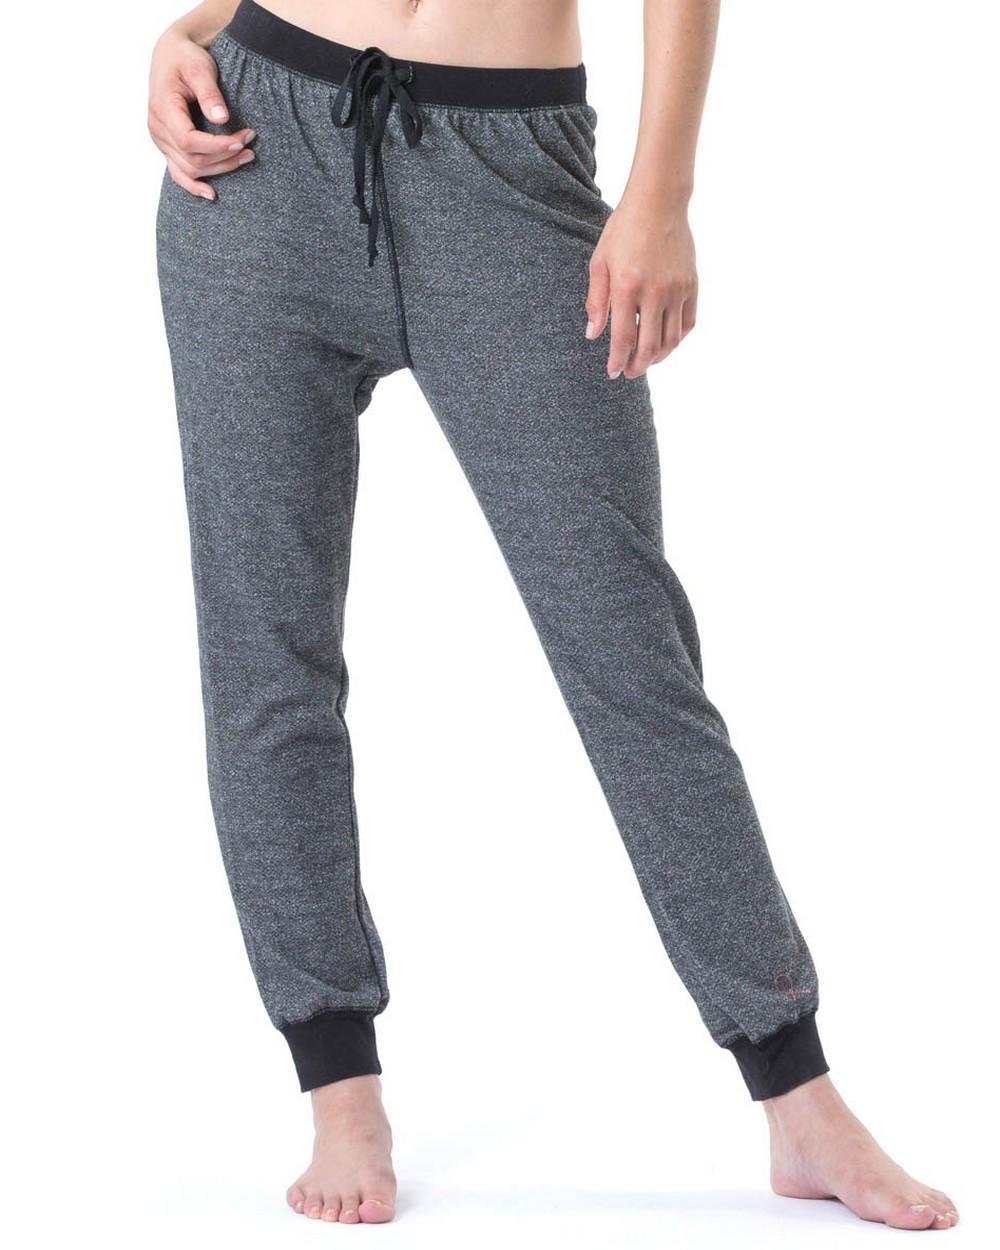 Electric Yoga Jogging Pants